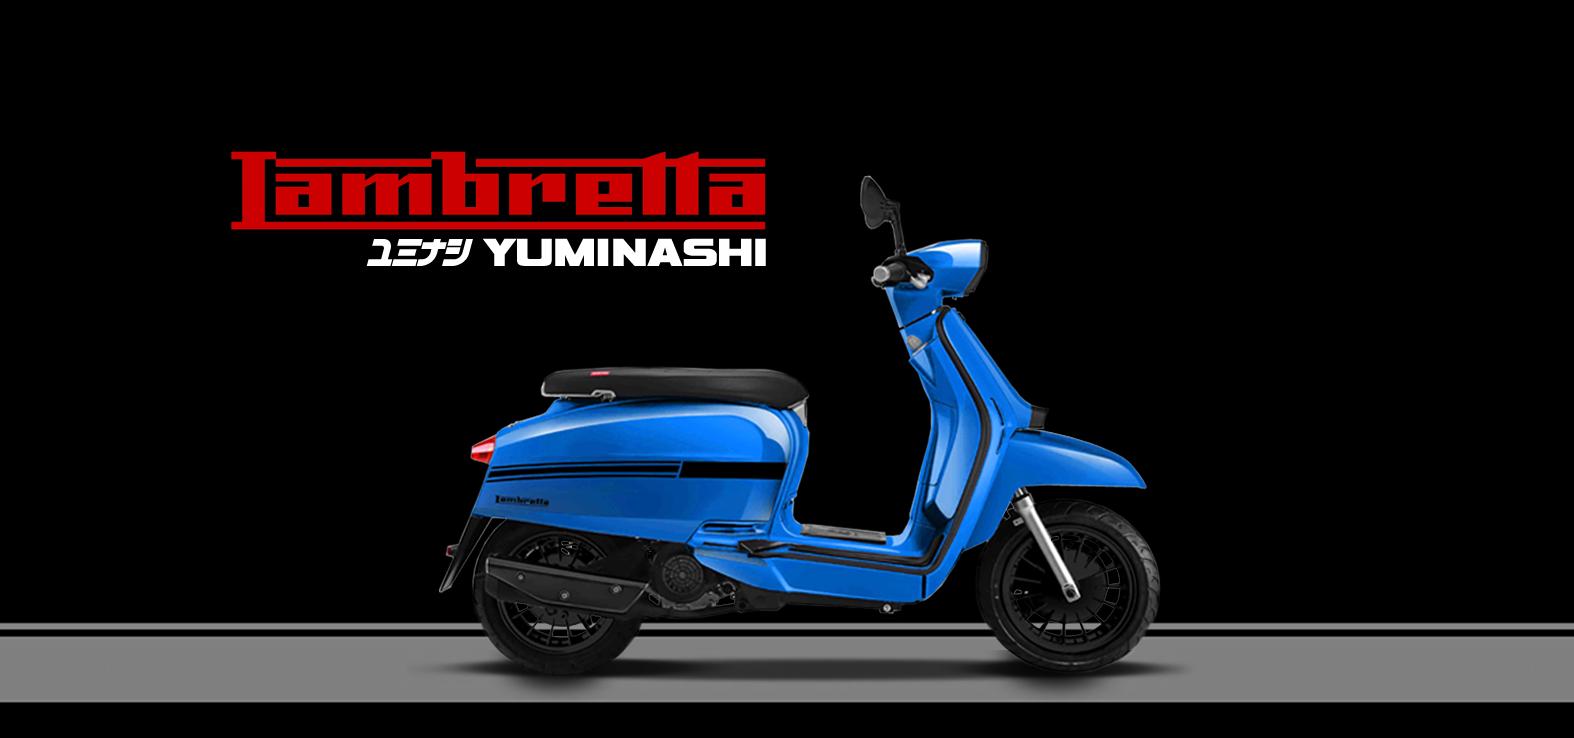 Yuminashi Tuning Parts For Lambretta Scooters